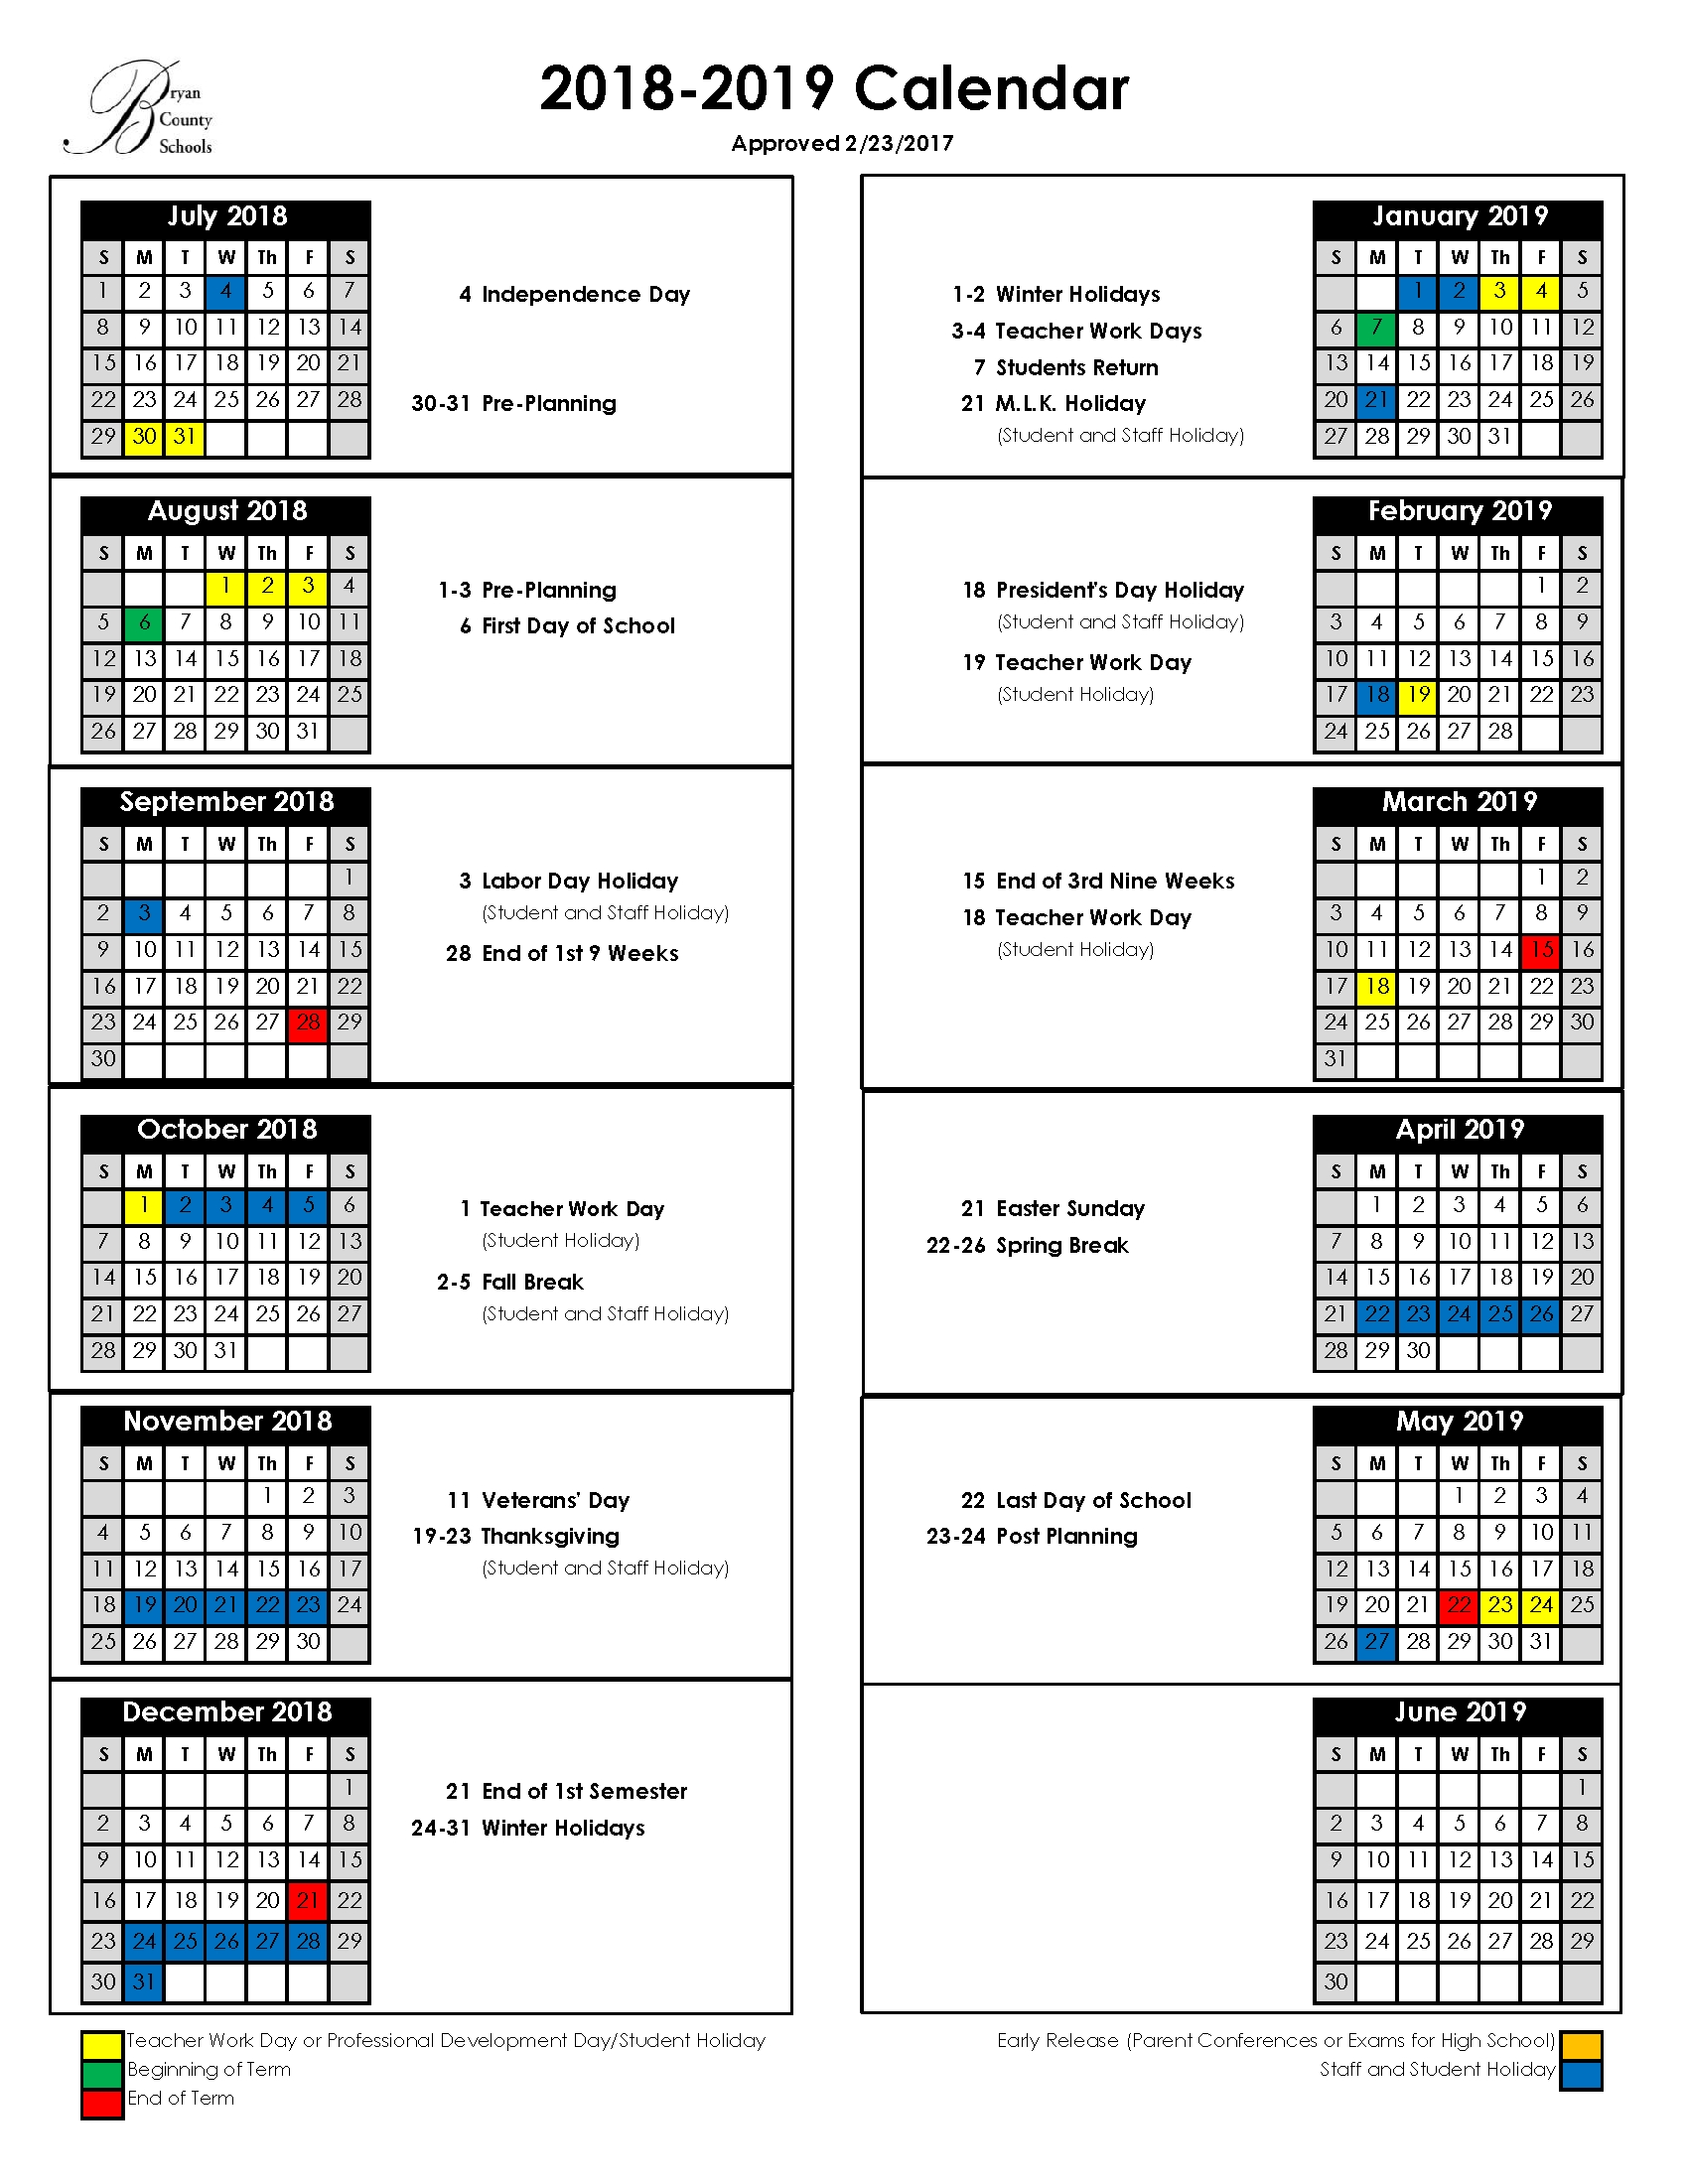 Bryan County Schools Calendar 2019 Thanksgiving